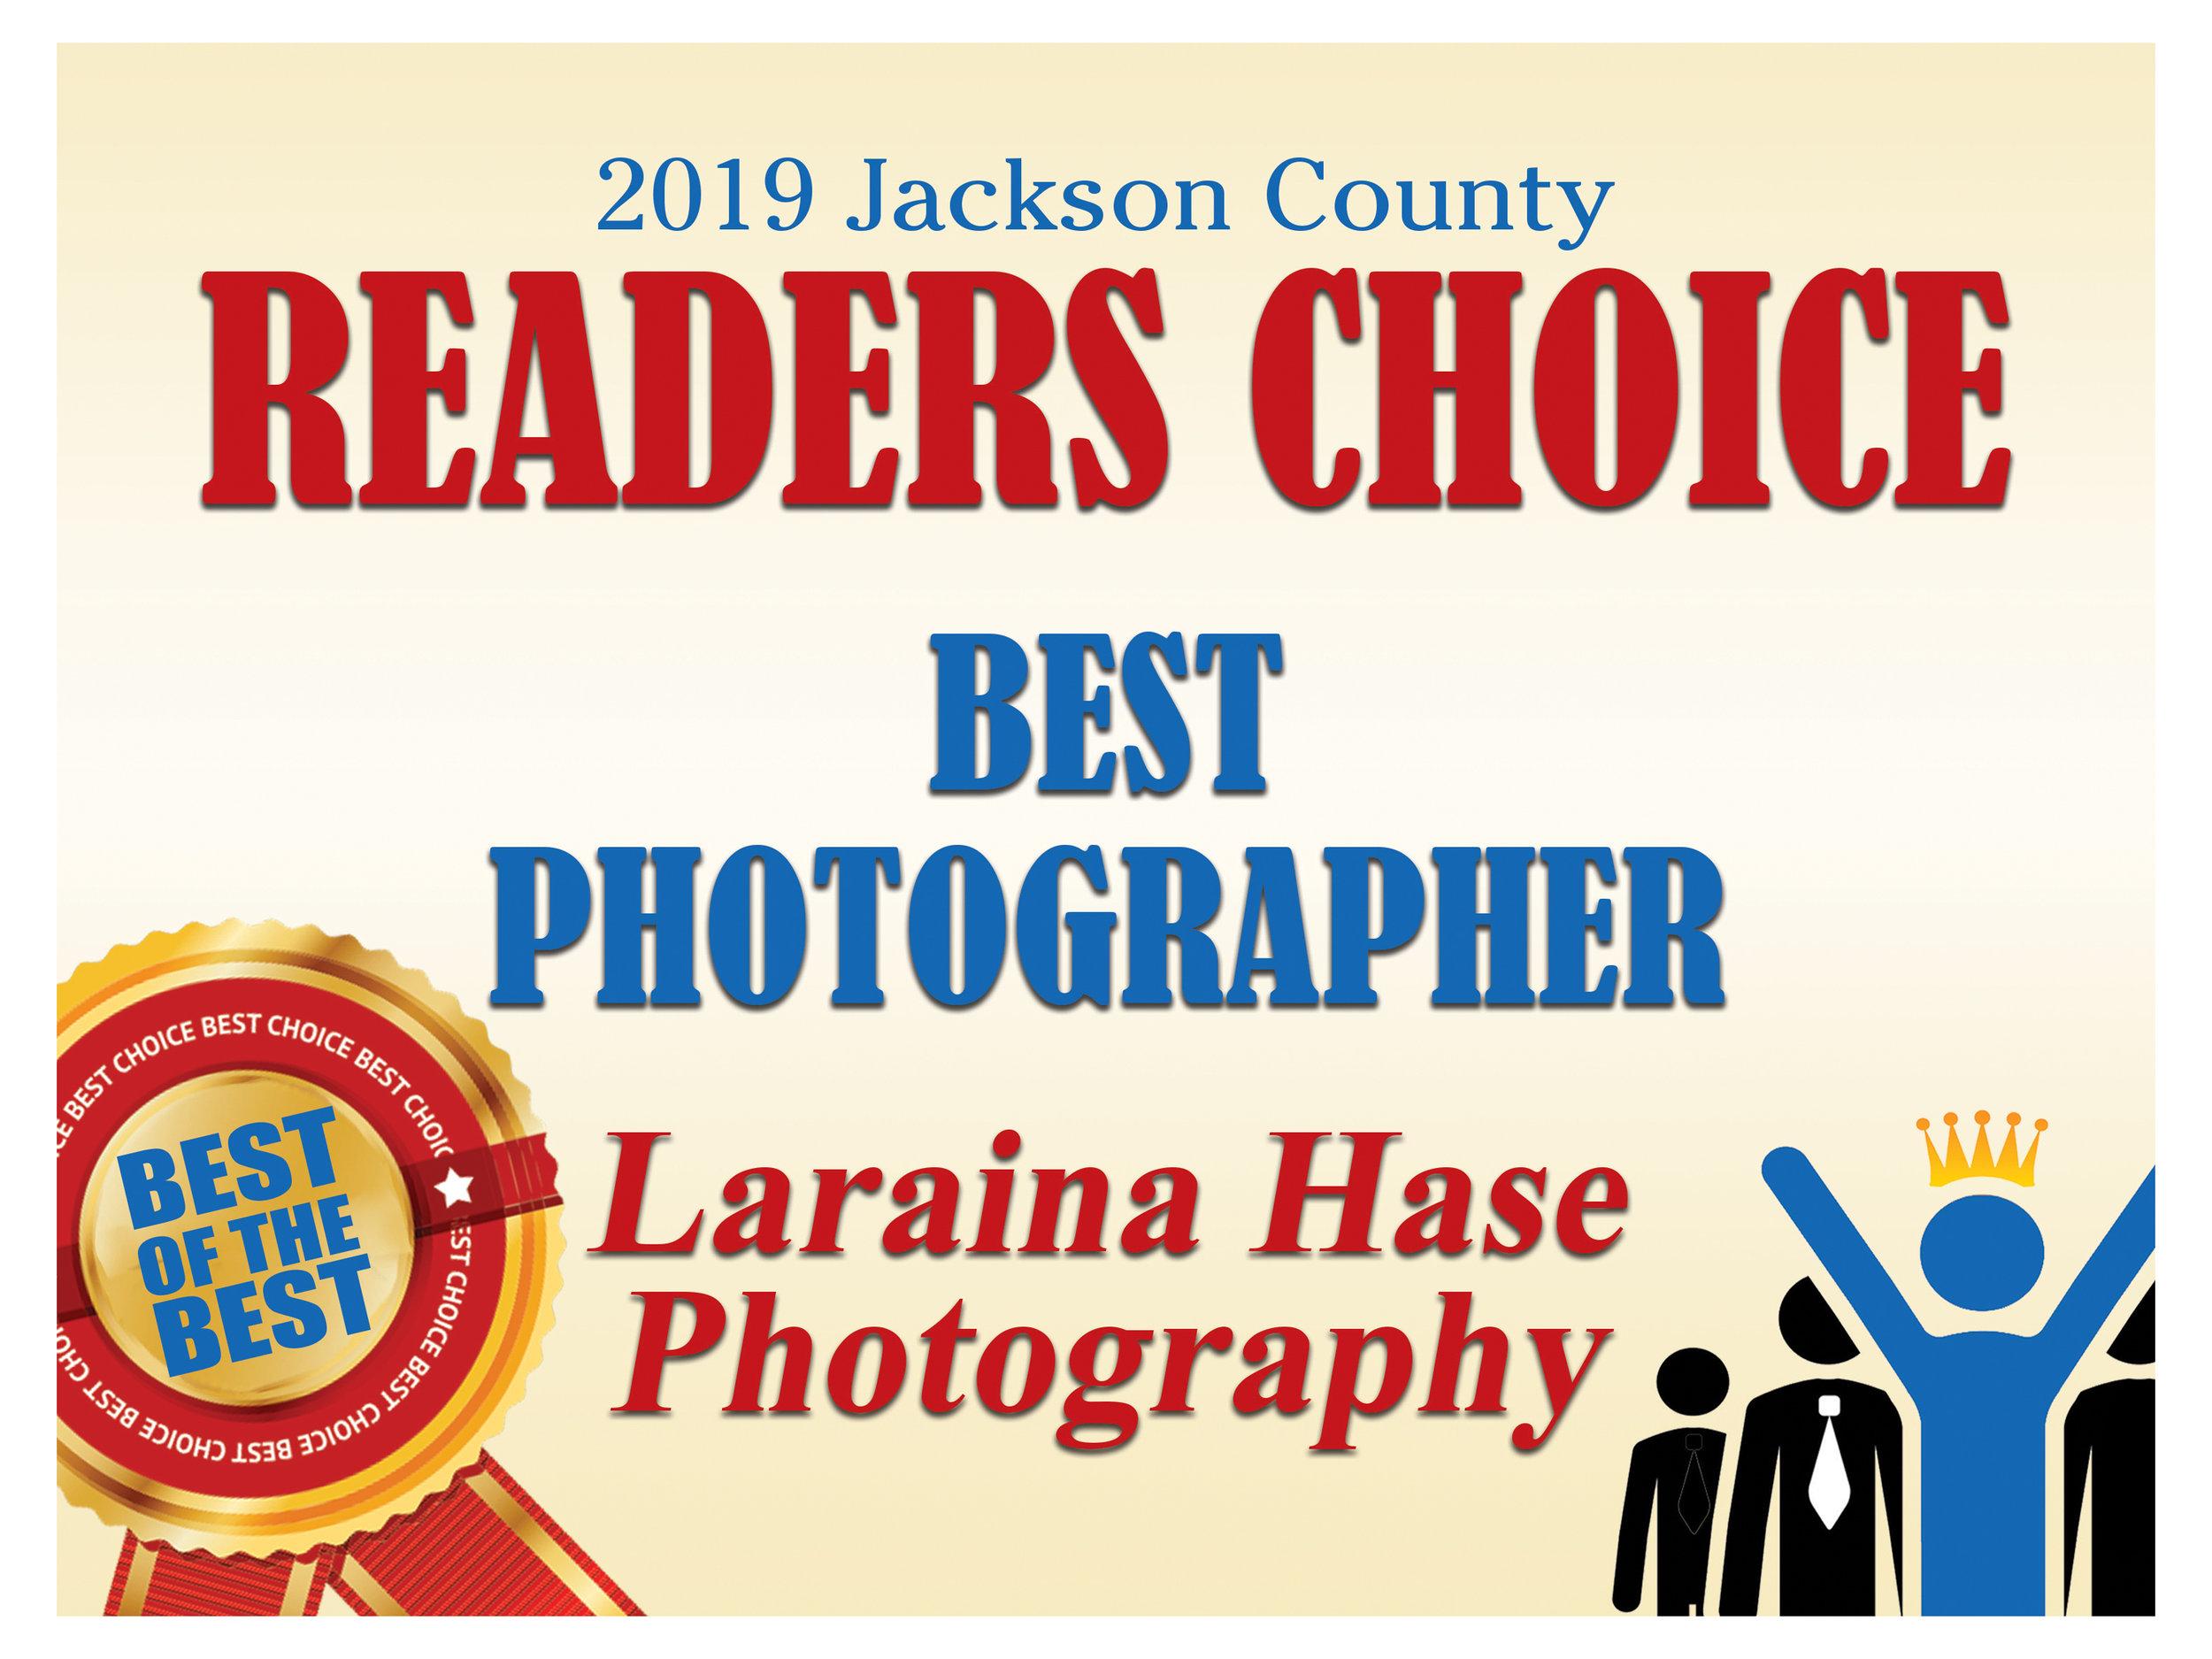 BestPhotographer2019.jpg